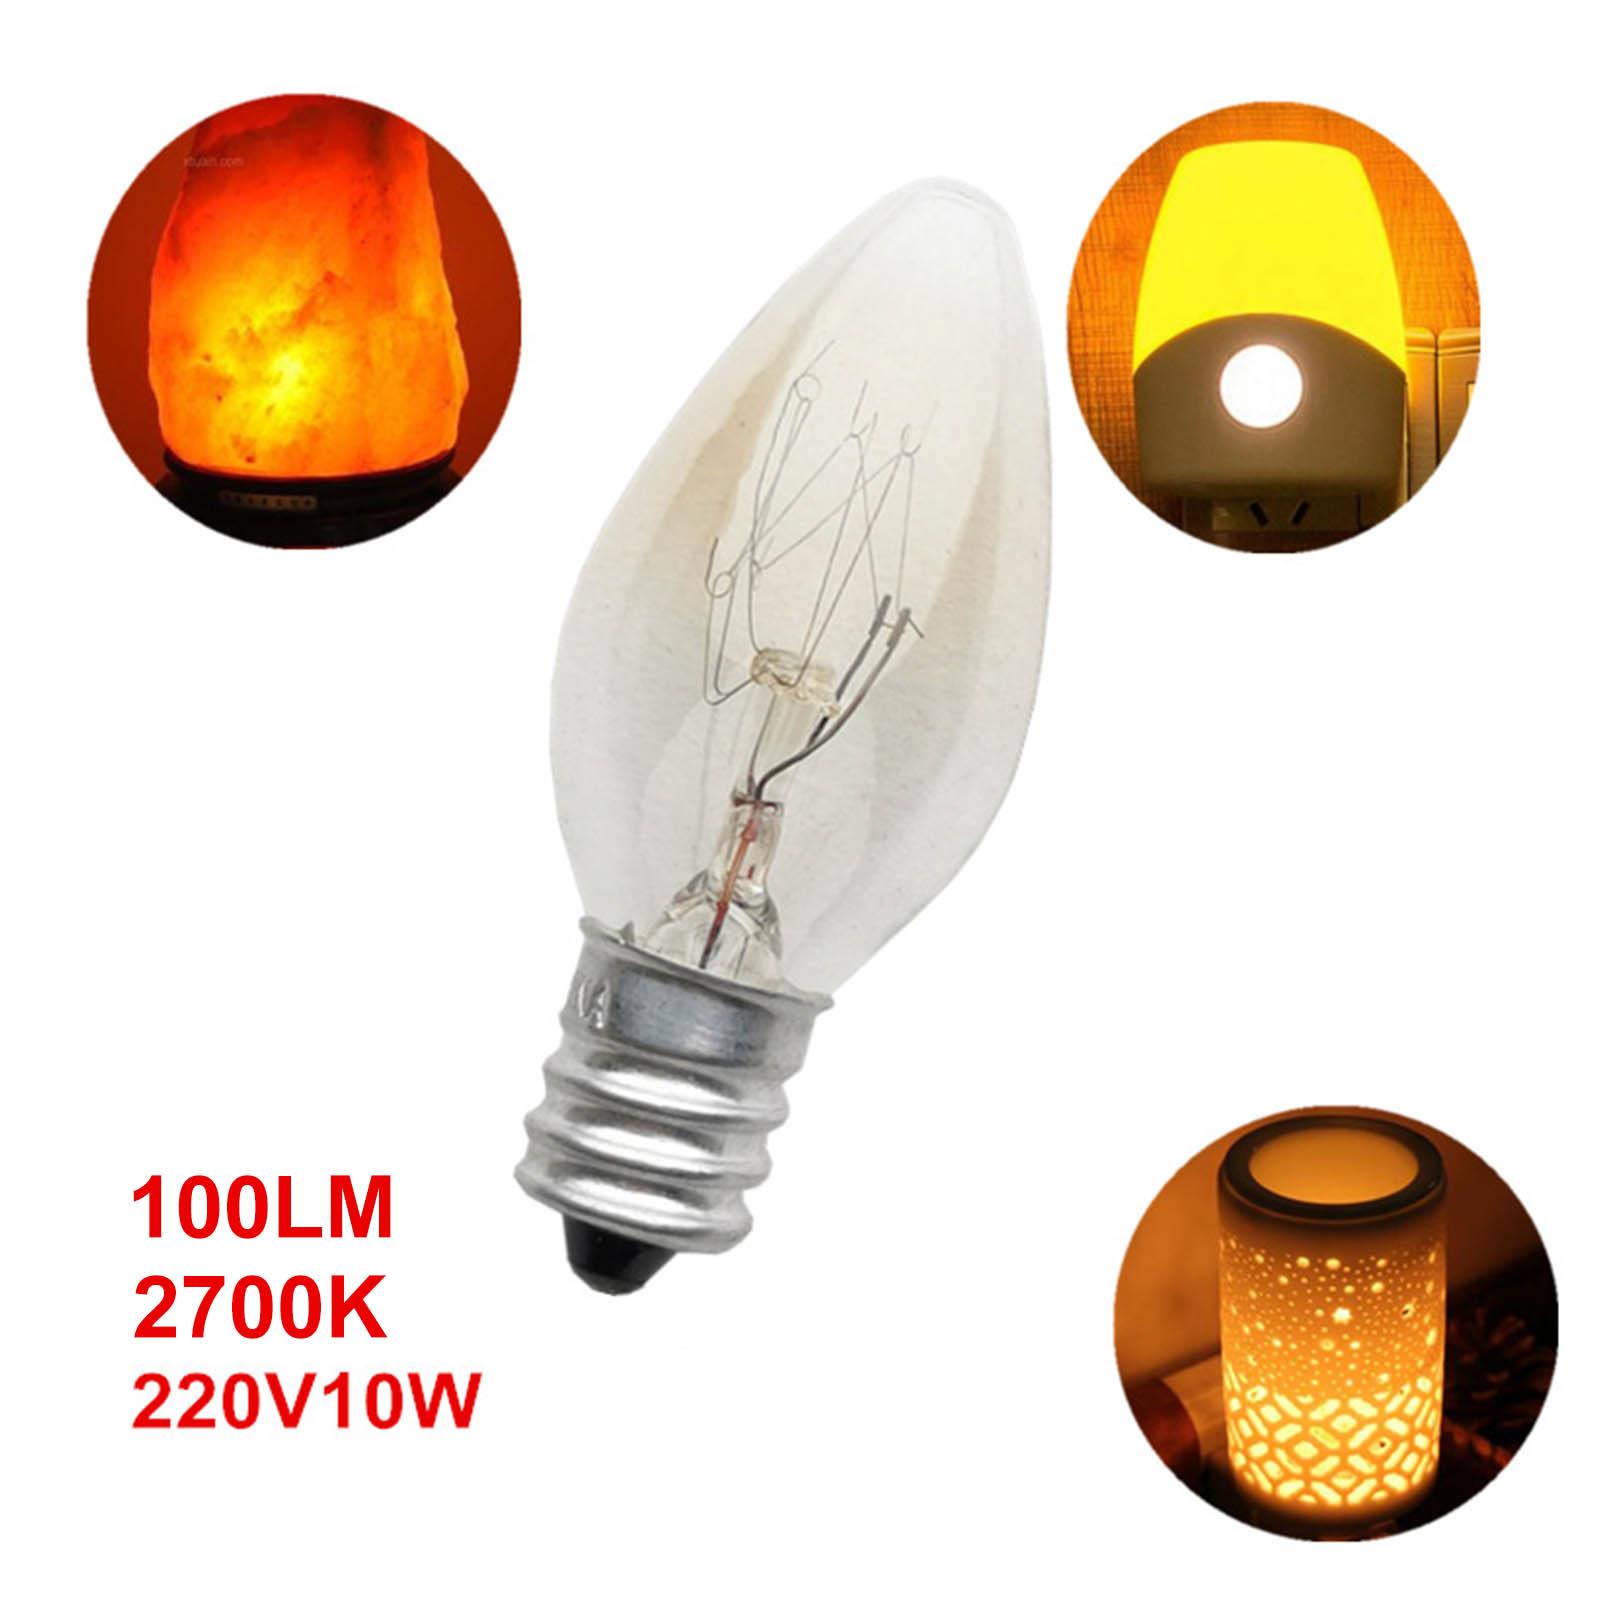 Лампа накаливания E12 C7, алюминиевая лампа накаливания с небольшим винтом, 220-240 В, 10 Вт, # W0